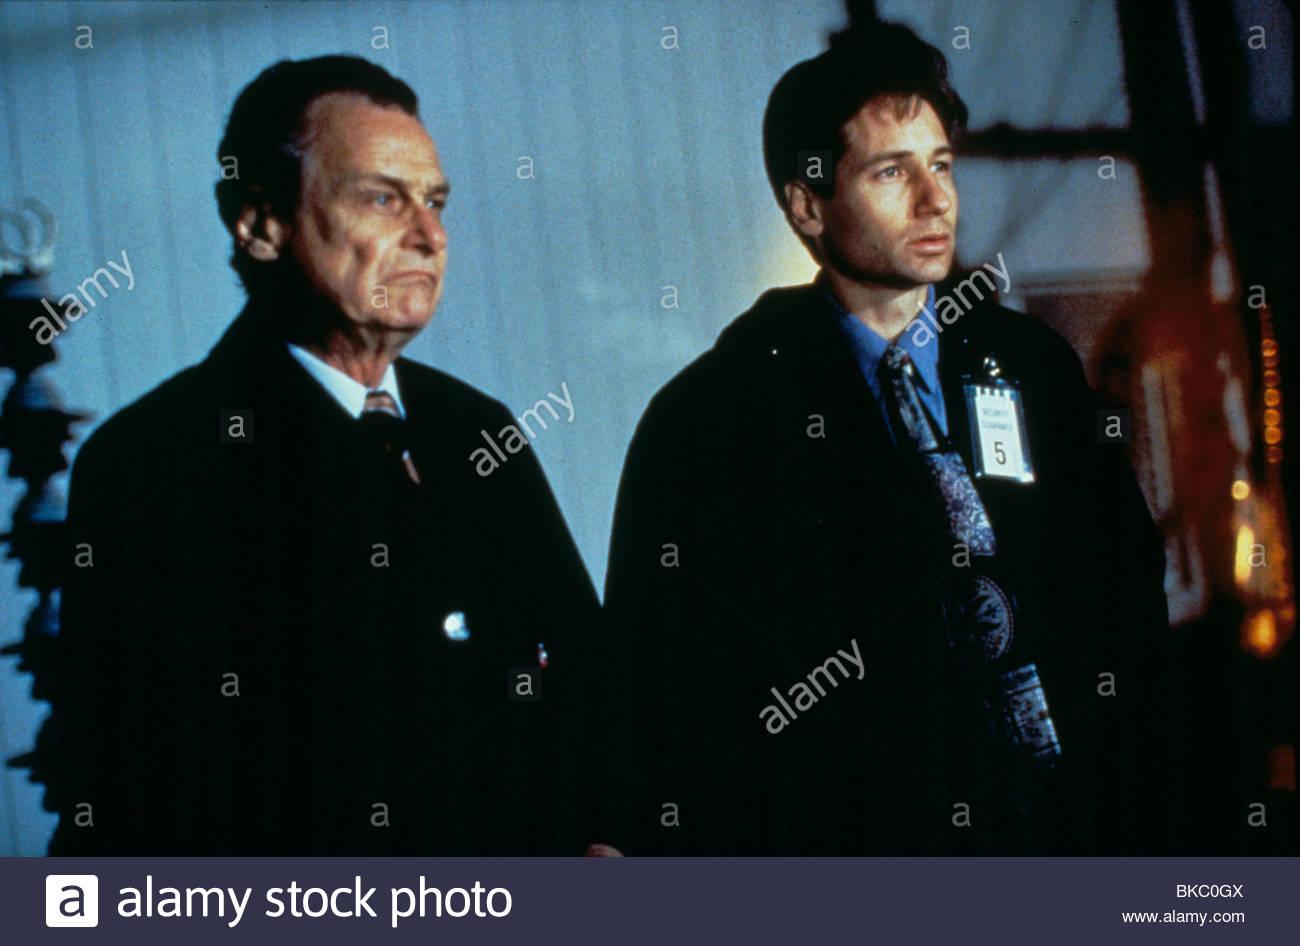 THE X-FILES (TV) JERRY HARDIN, DAVID DUCHOVNY XFIL 029 - Stock Image